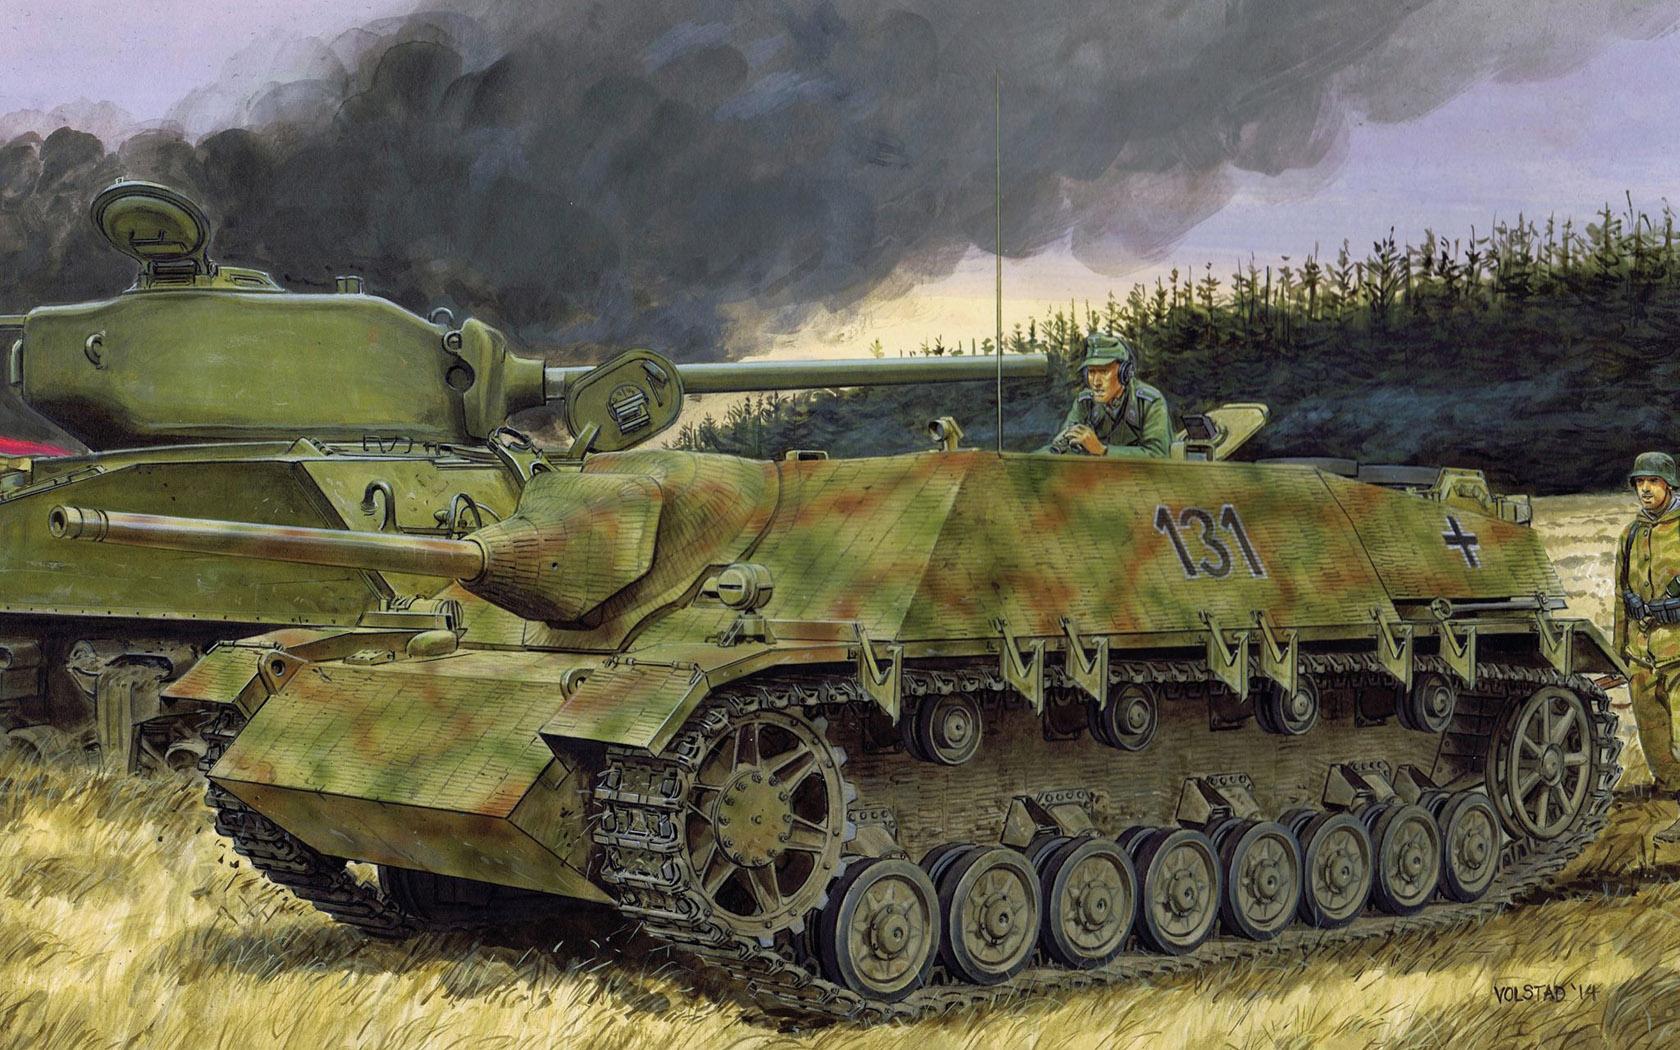 рисунок Jagdpanzer IV L48 July 1944 Production w/Zimmerit